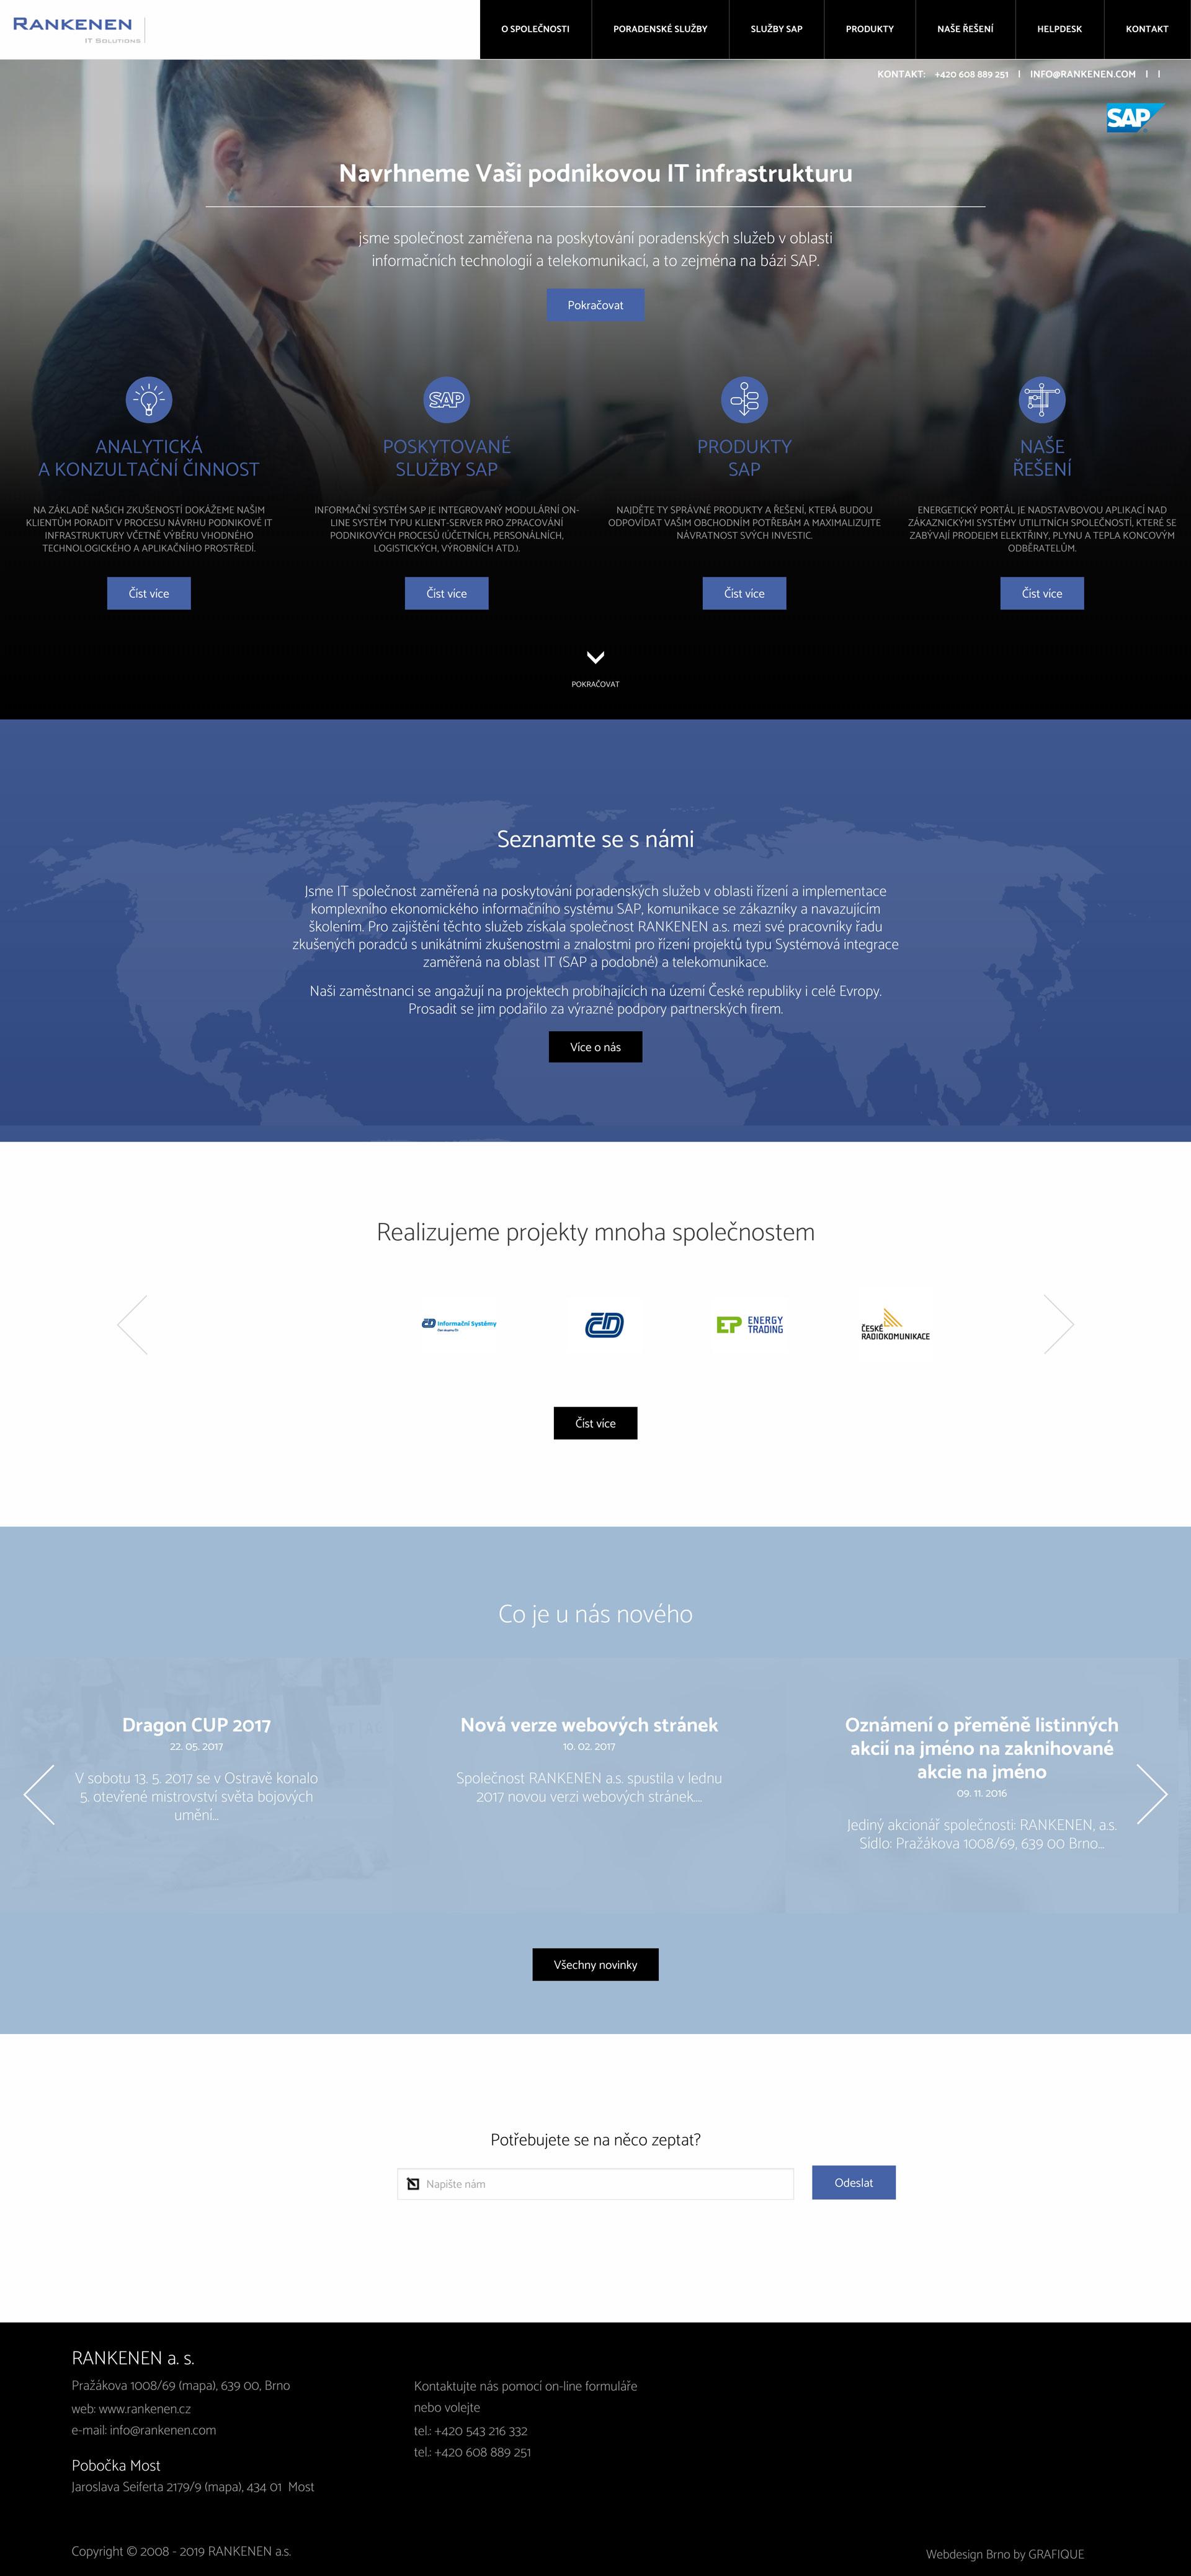 RANKENEN a.s. - realizace, Webdesign